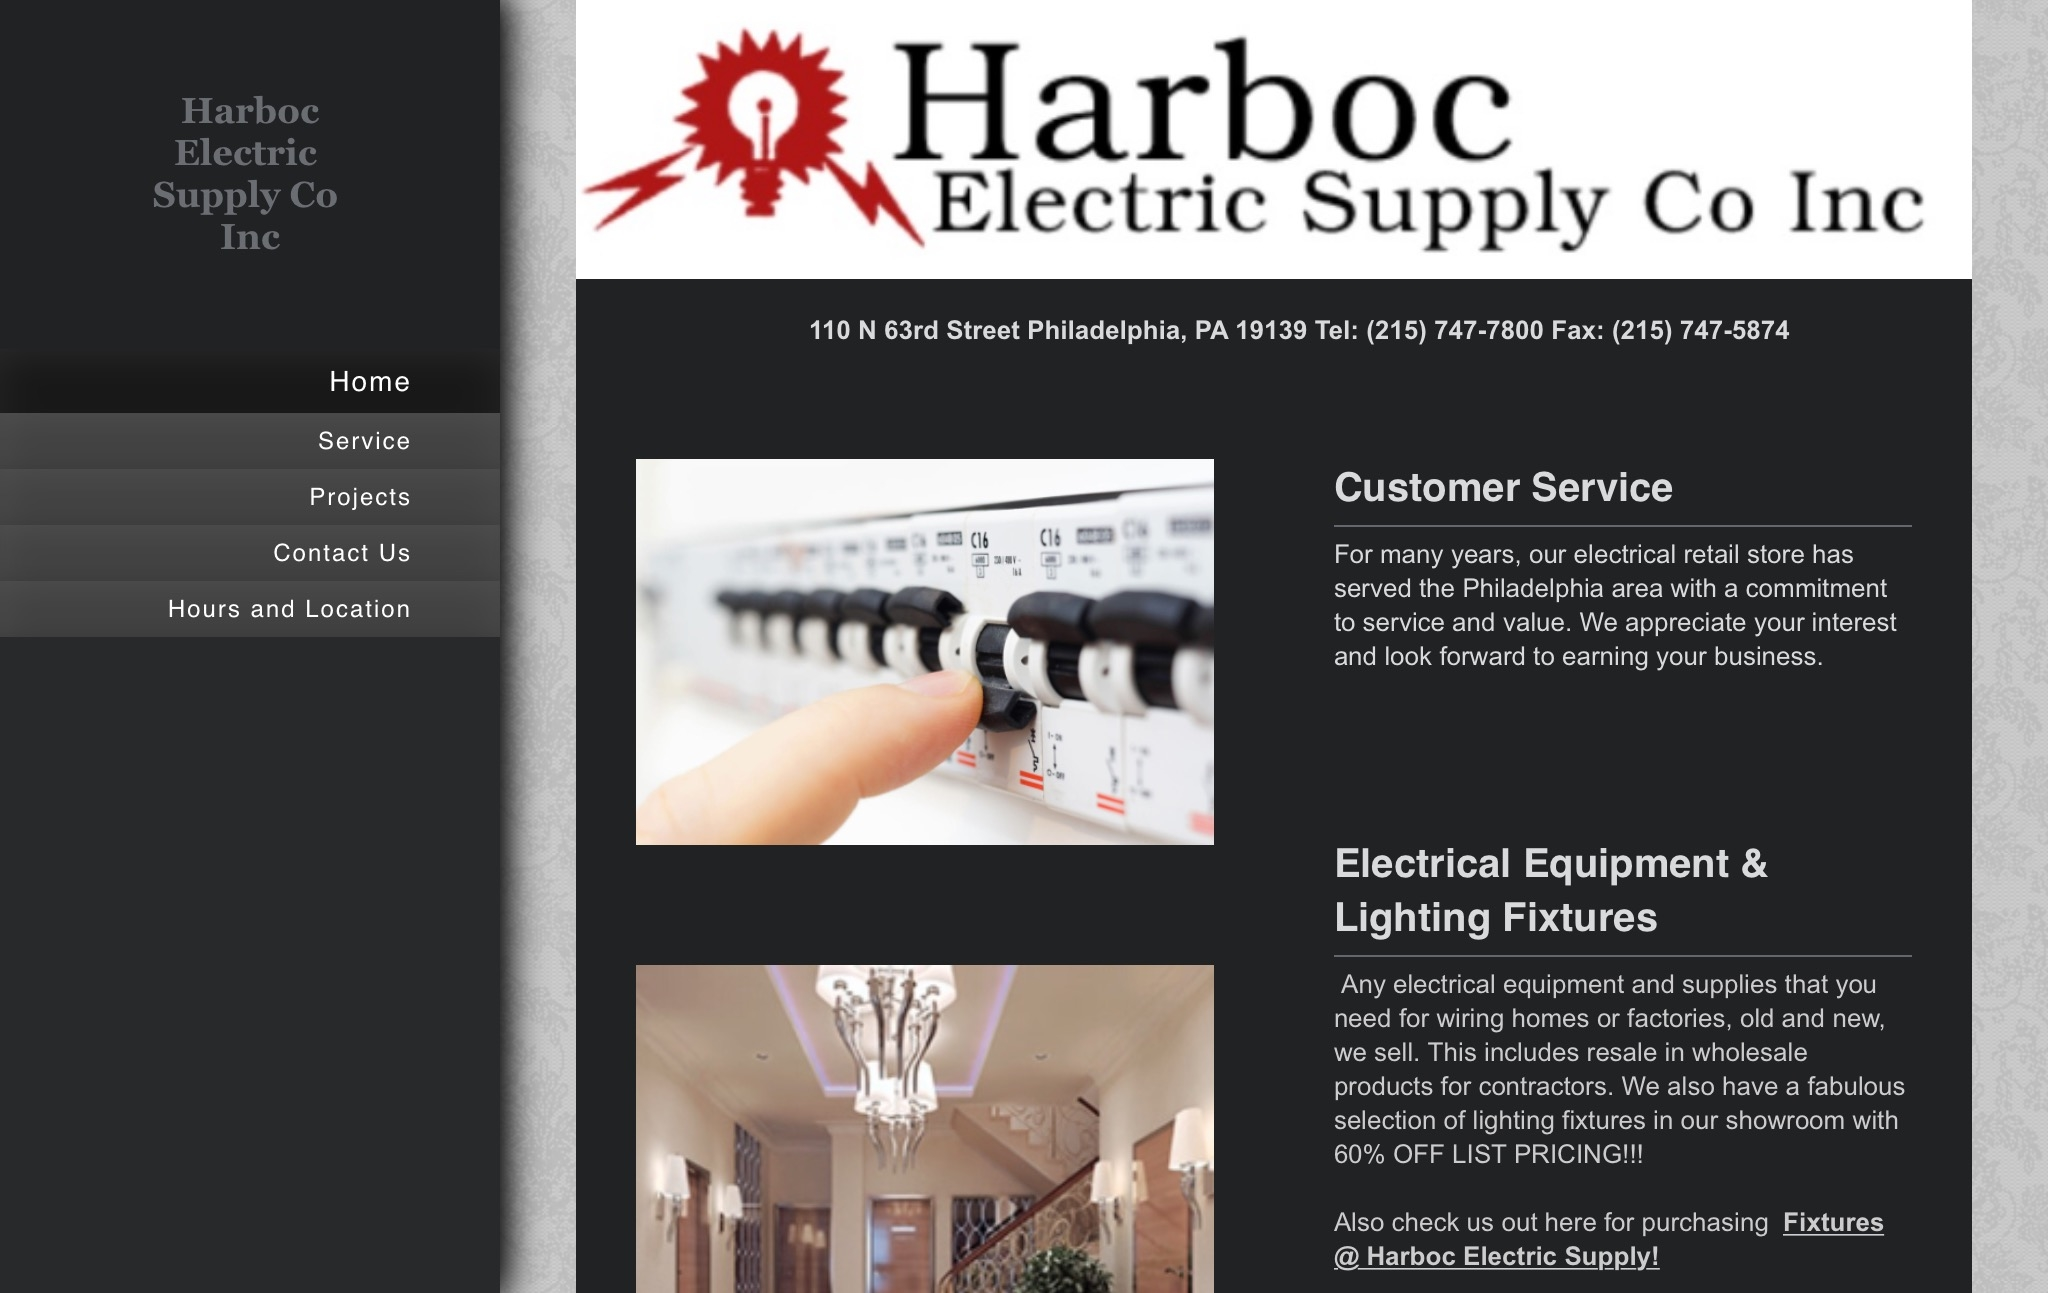 Harboc Electric Supply Co Inc